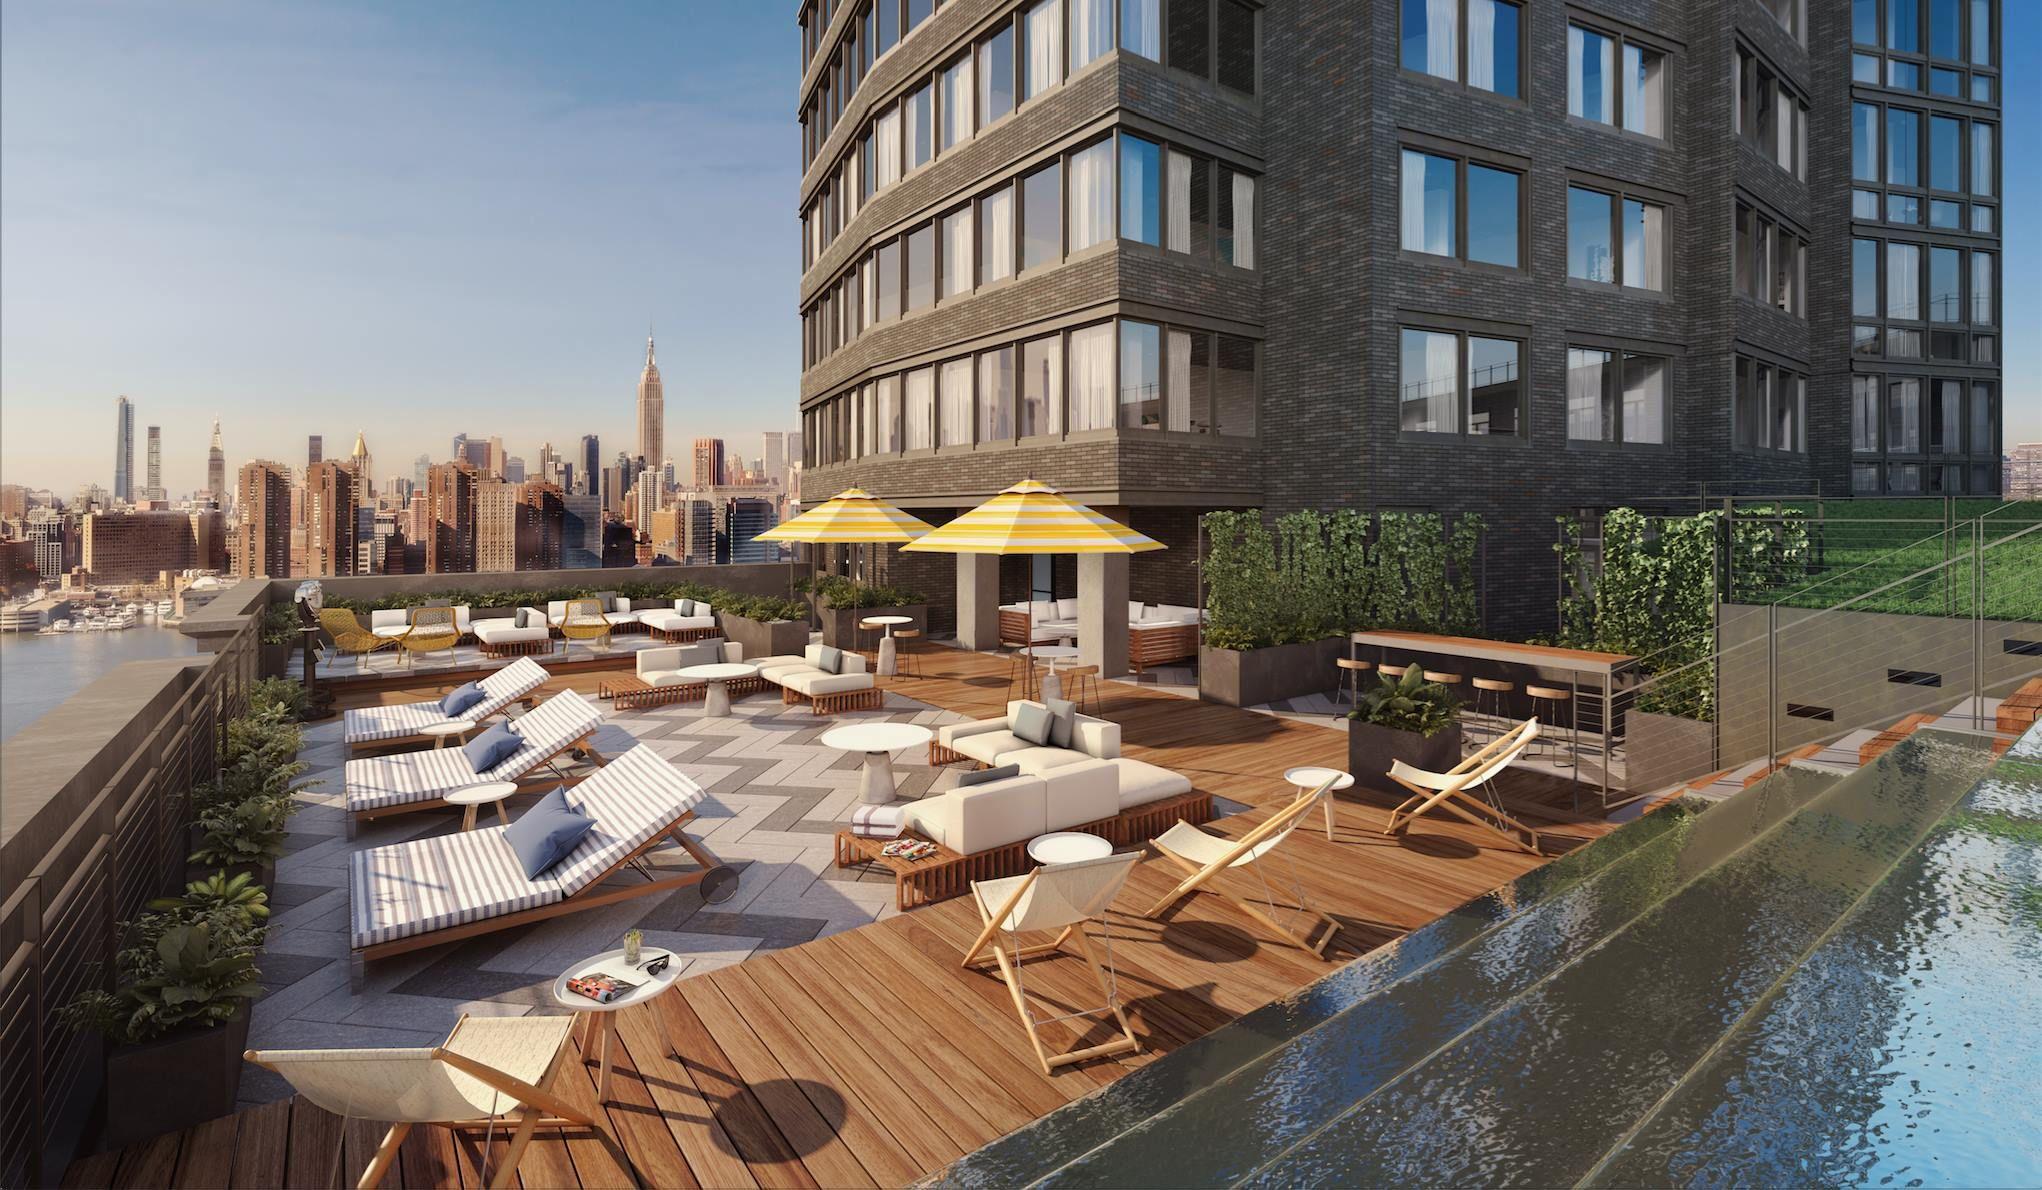 Greenpoint S Tallest Tower Reveals Swanky Basketball Court Sun Deck In New Renders Building Terrace Garden Outdoor Furniture Sets